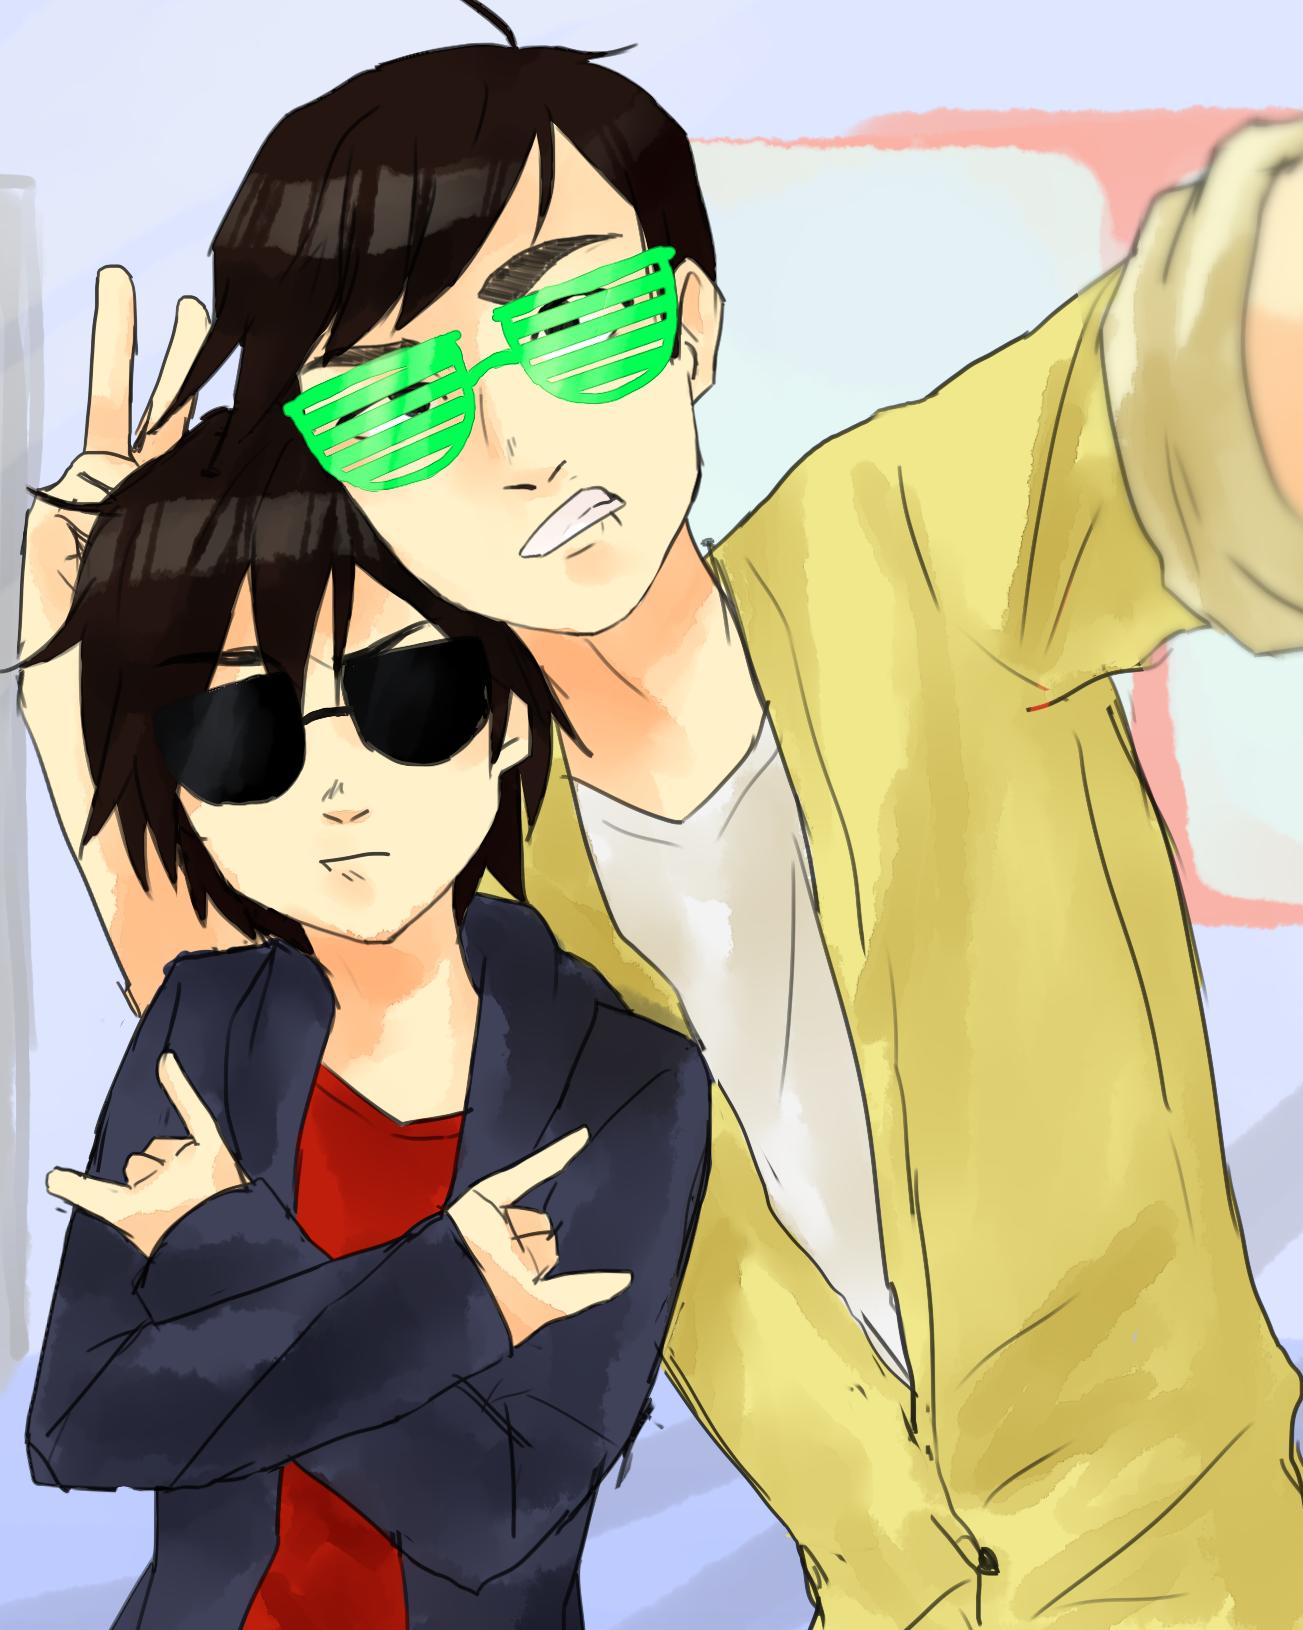 Hiro Hamada And Tadashi Hamada Tadashi And Hiro Hamada in